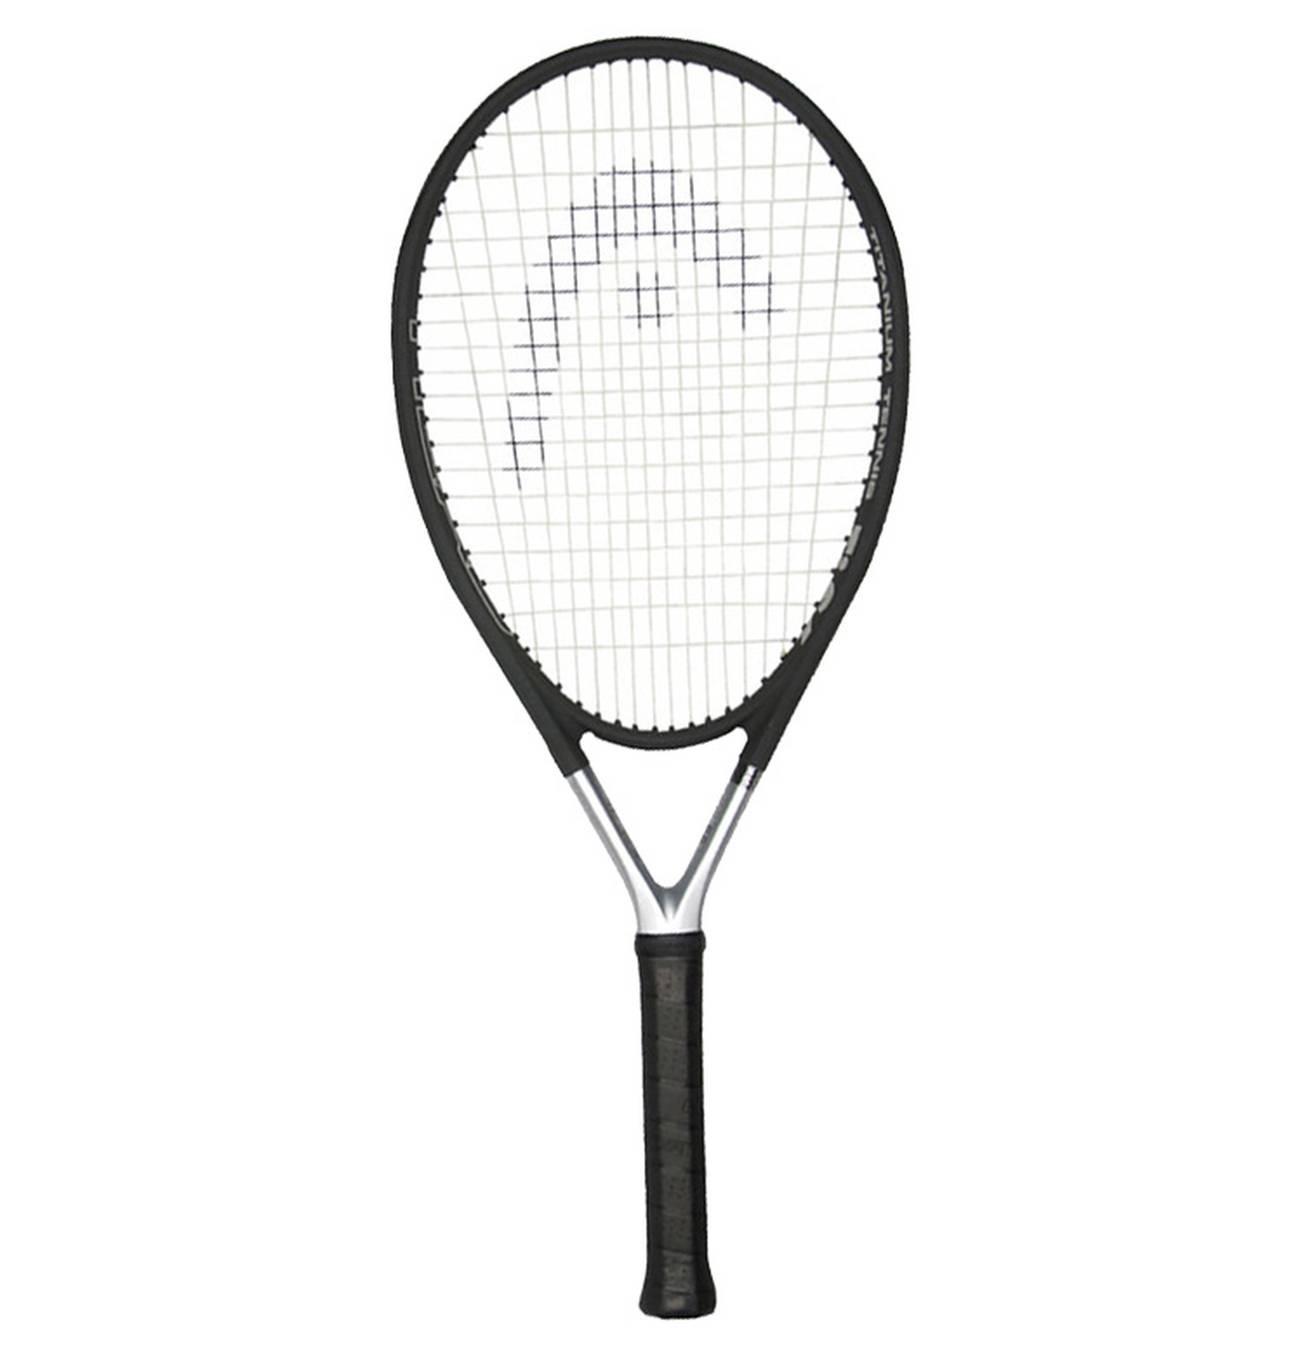 S6/BESAITET Tennisschl/äger besaitet HEAD 2017/Ti